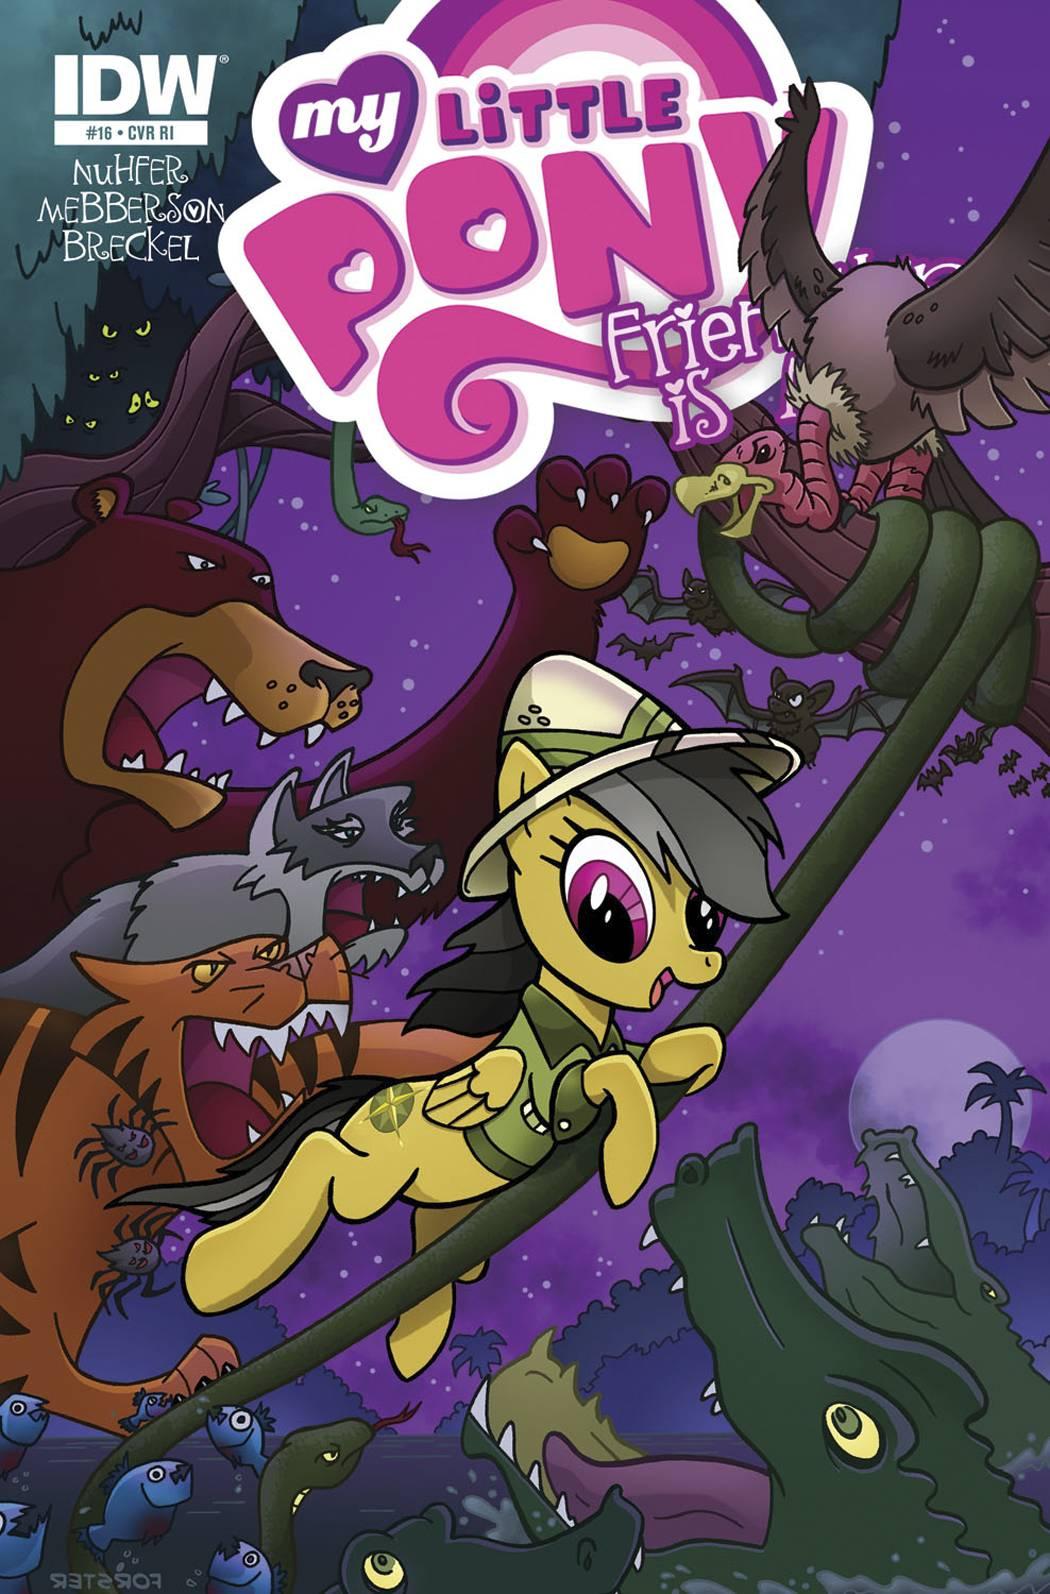 My Little Pony: Friendship Is Magic #16 (2014)